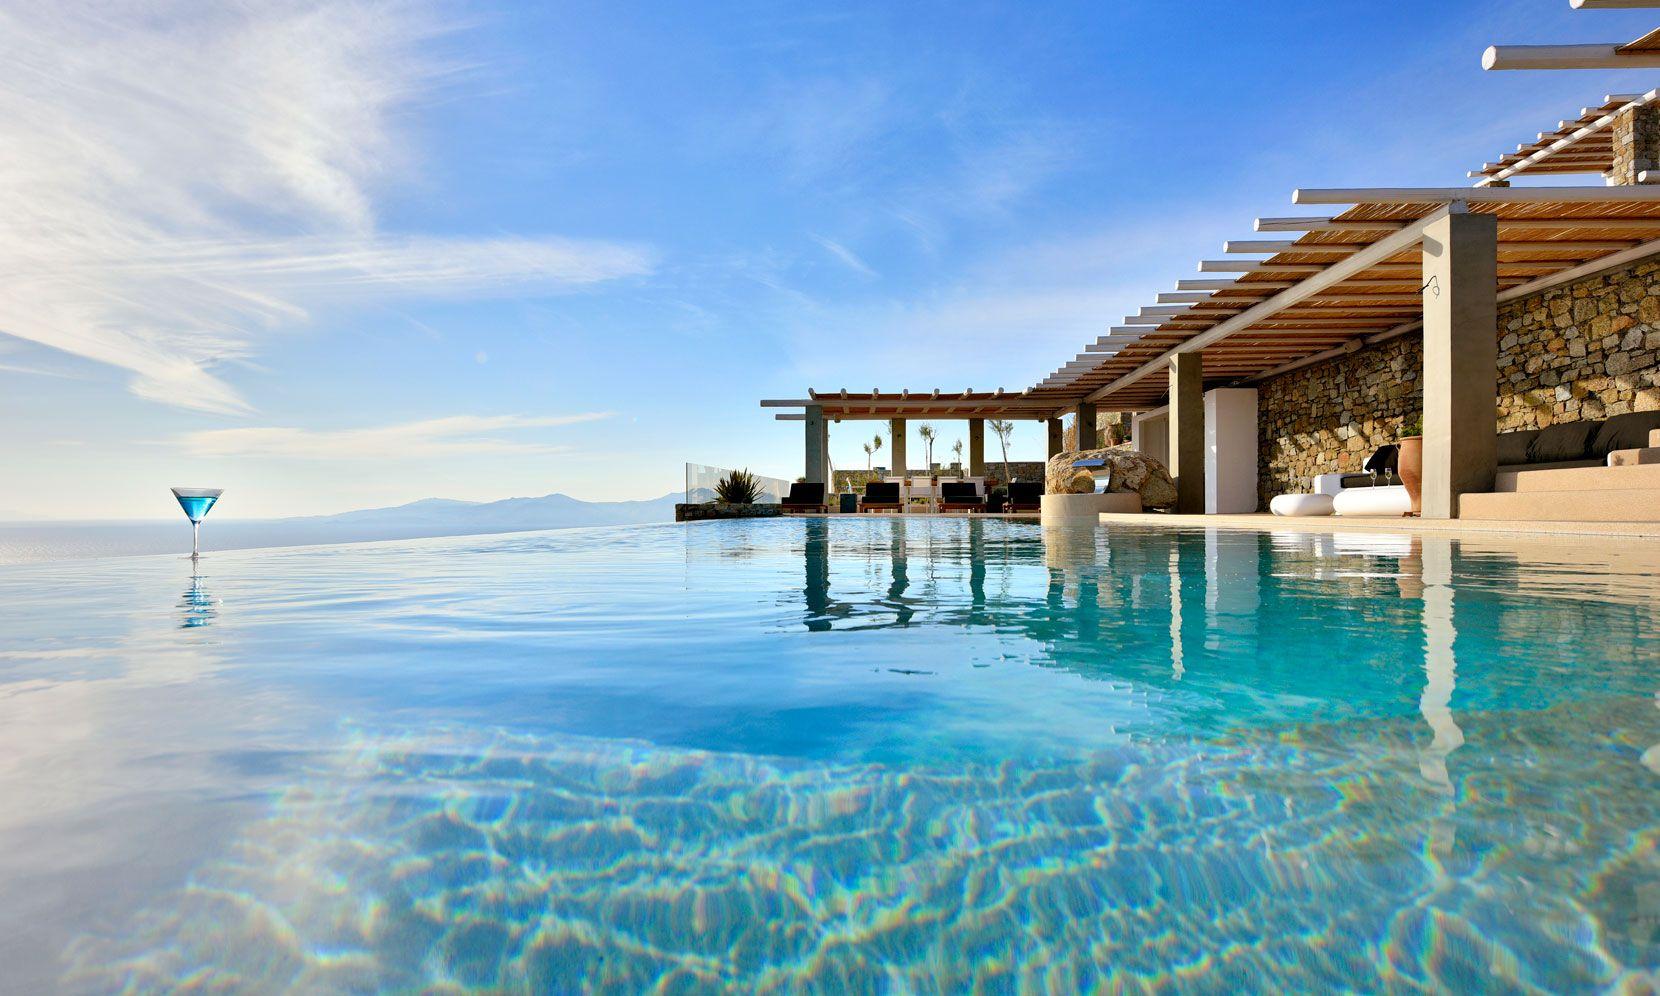 Mykonos Villa Amethyst 2 jumbotron image